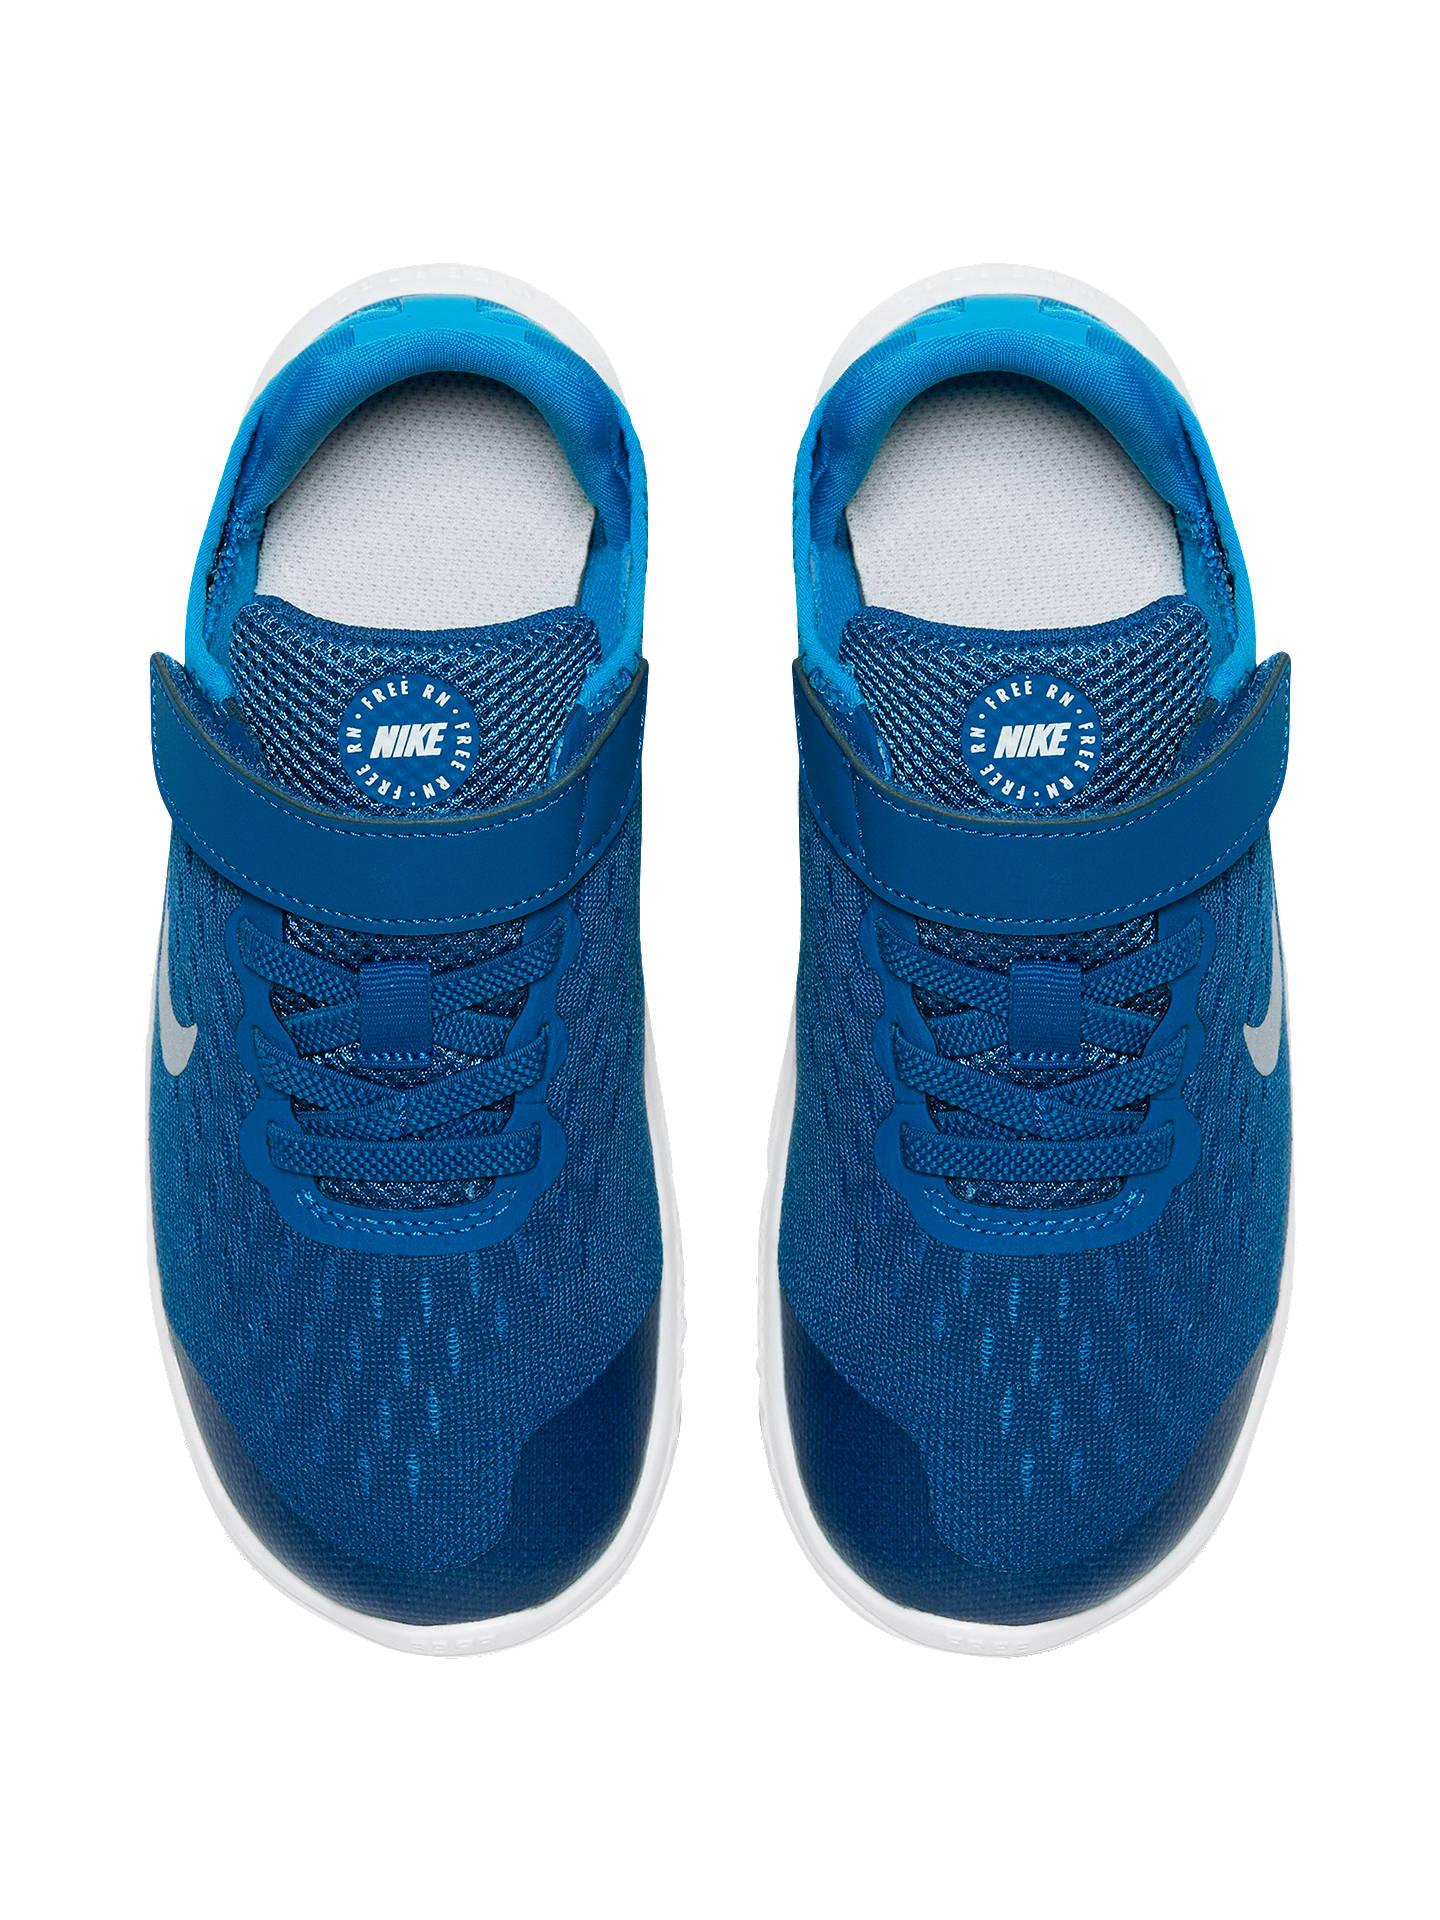 new concept 27b58 1c9b6 Nike Children's Free RN 2018 Riptape Trainers at John Lewis ...